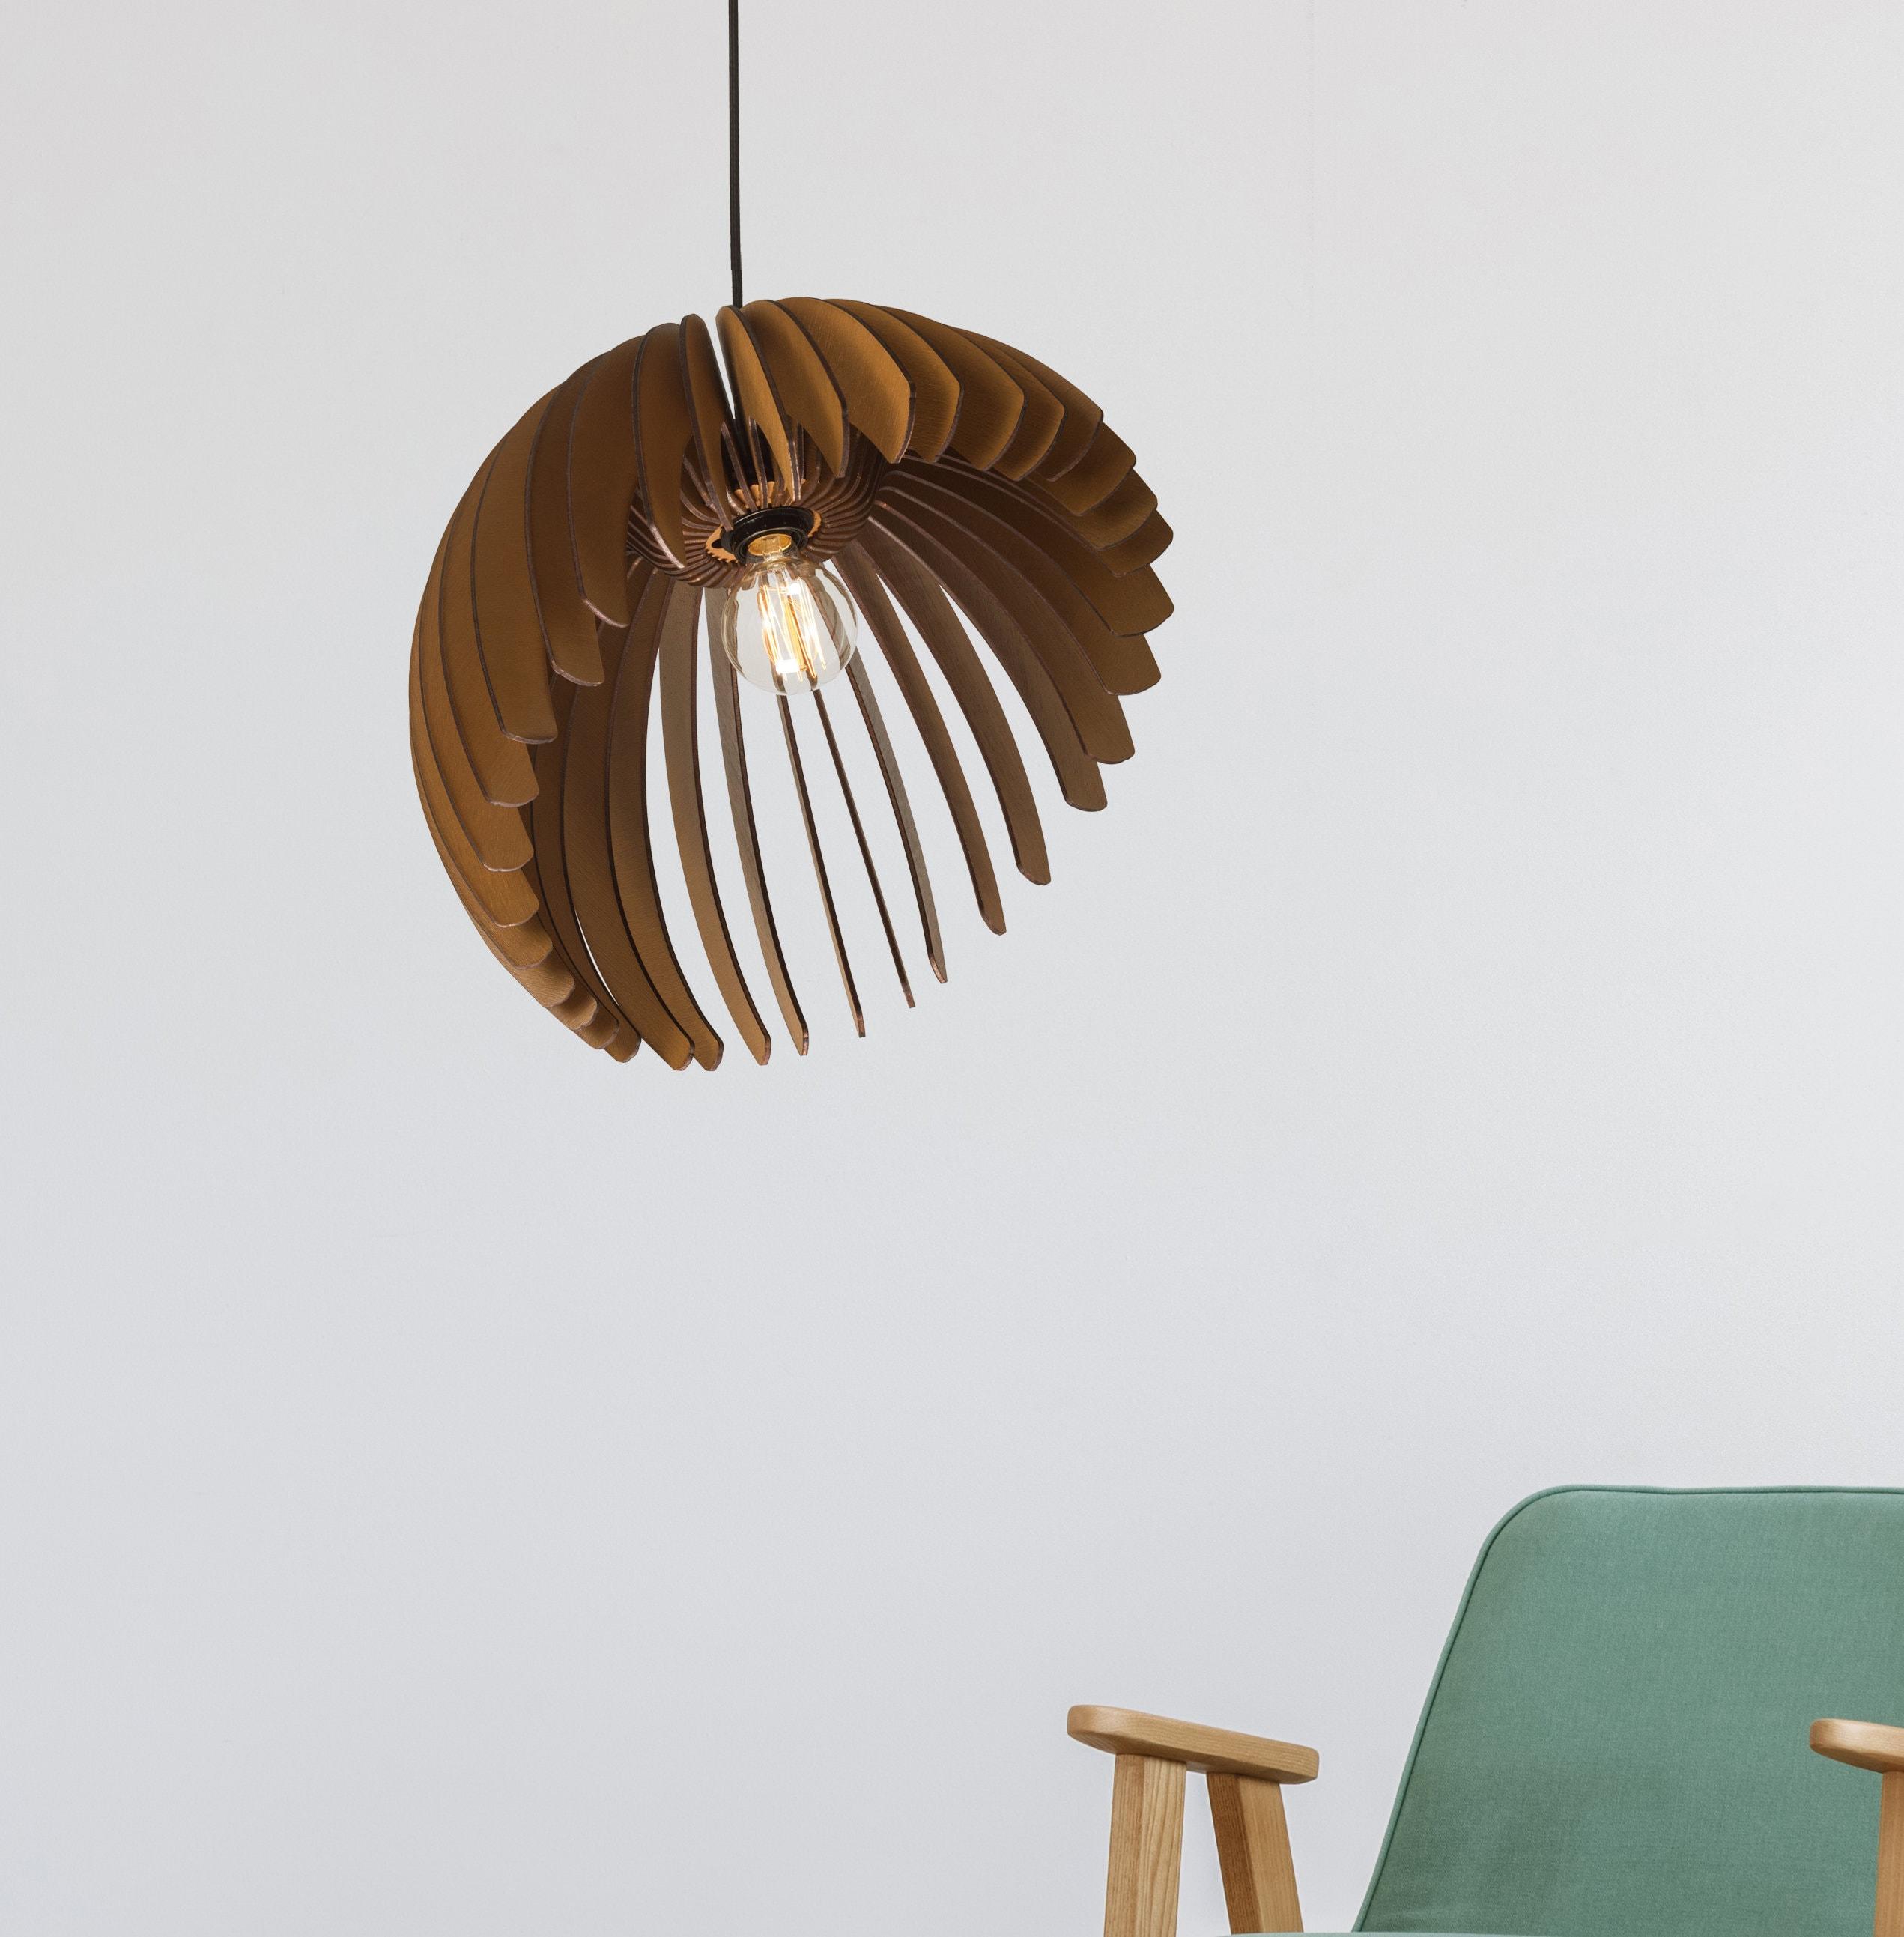 industrial modern lighting. Pendant Light Wood Lamp Ceiling Fixture Dining Industrial Modern Chandelier Hanging Steampunk Wooden E27 Lighting O